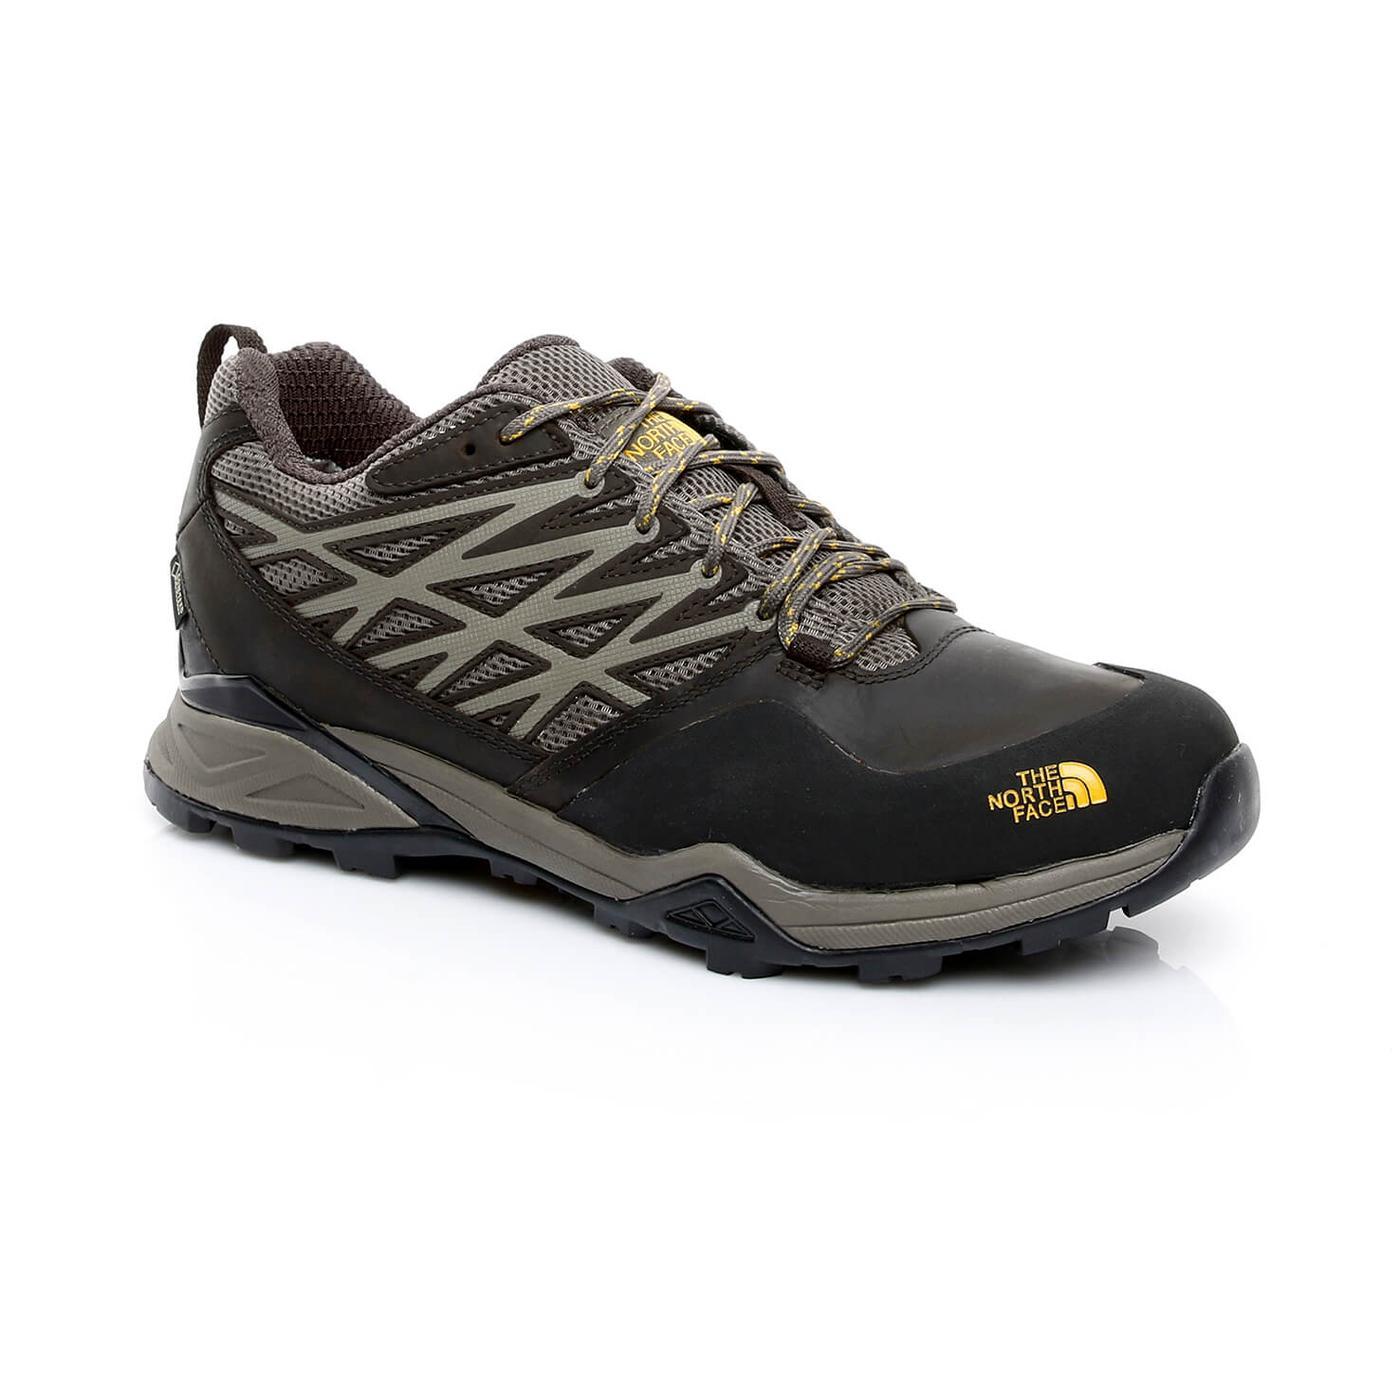 The North Face Hedgehog Hike Gore Tex Erkek Kahverengi Spor Ayakkabı